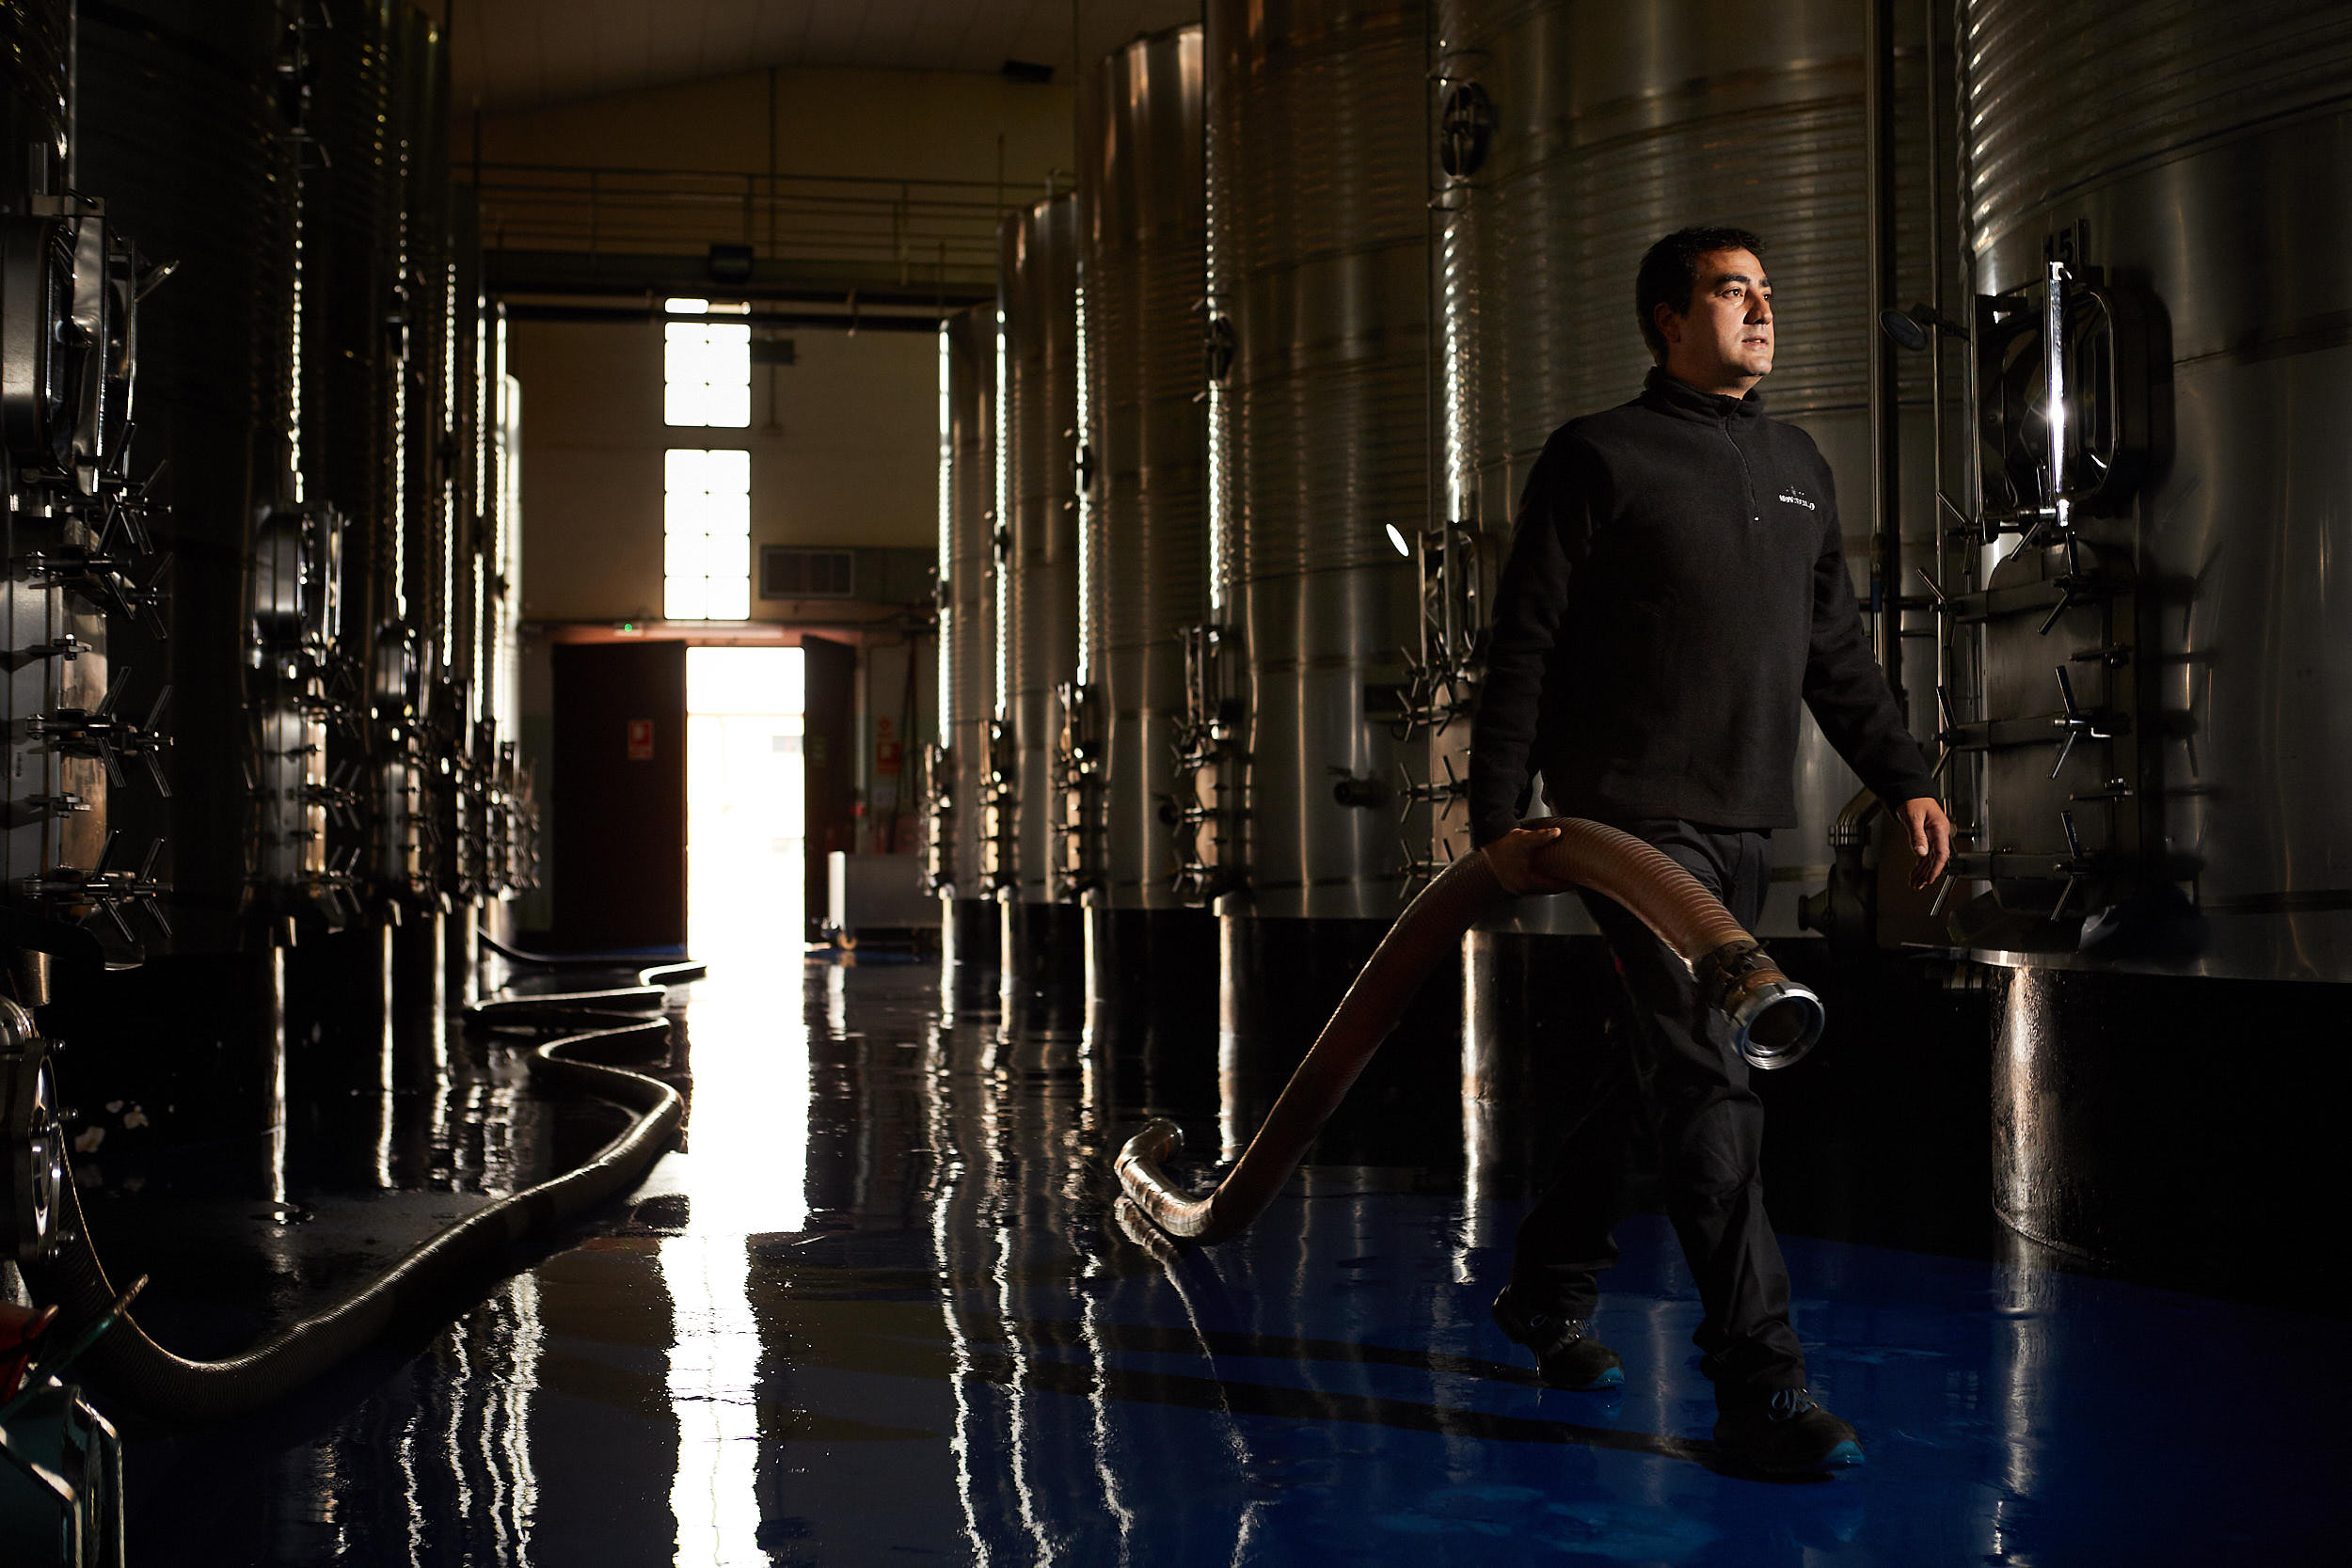 1805fotografia-profesional-corporativa-vino-rioja-espana-James-Sturcke_0016.jpg